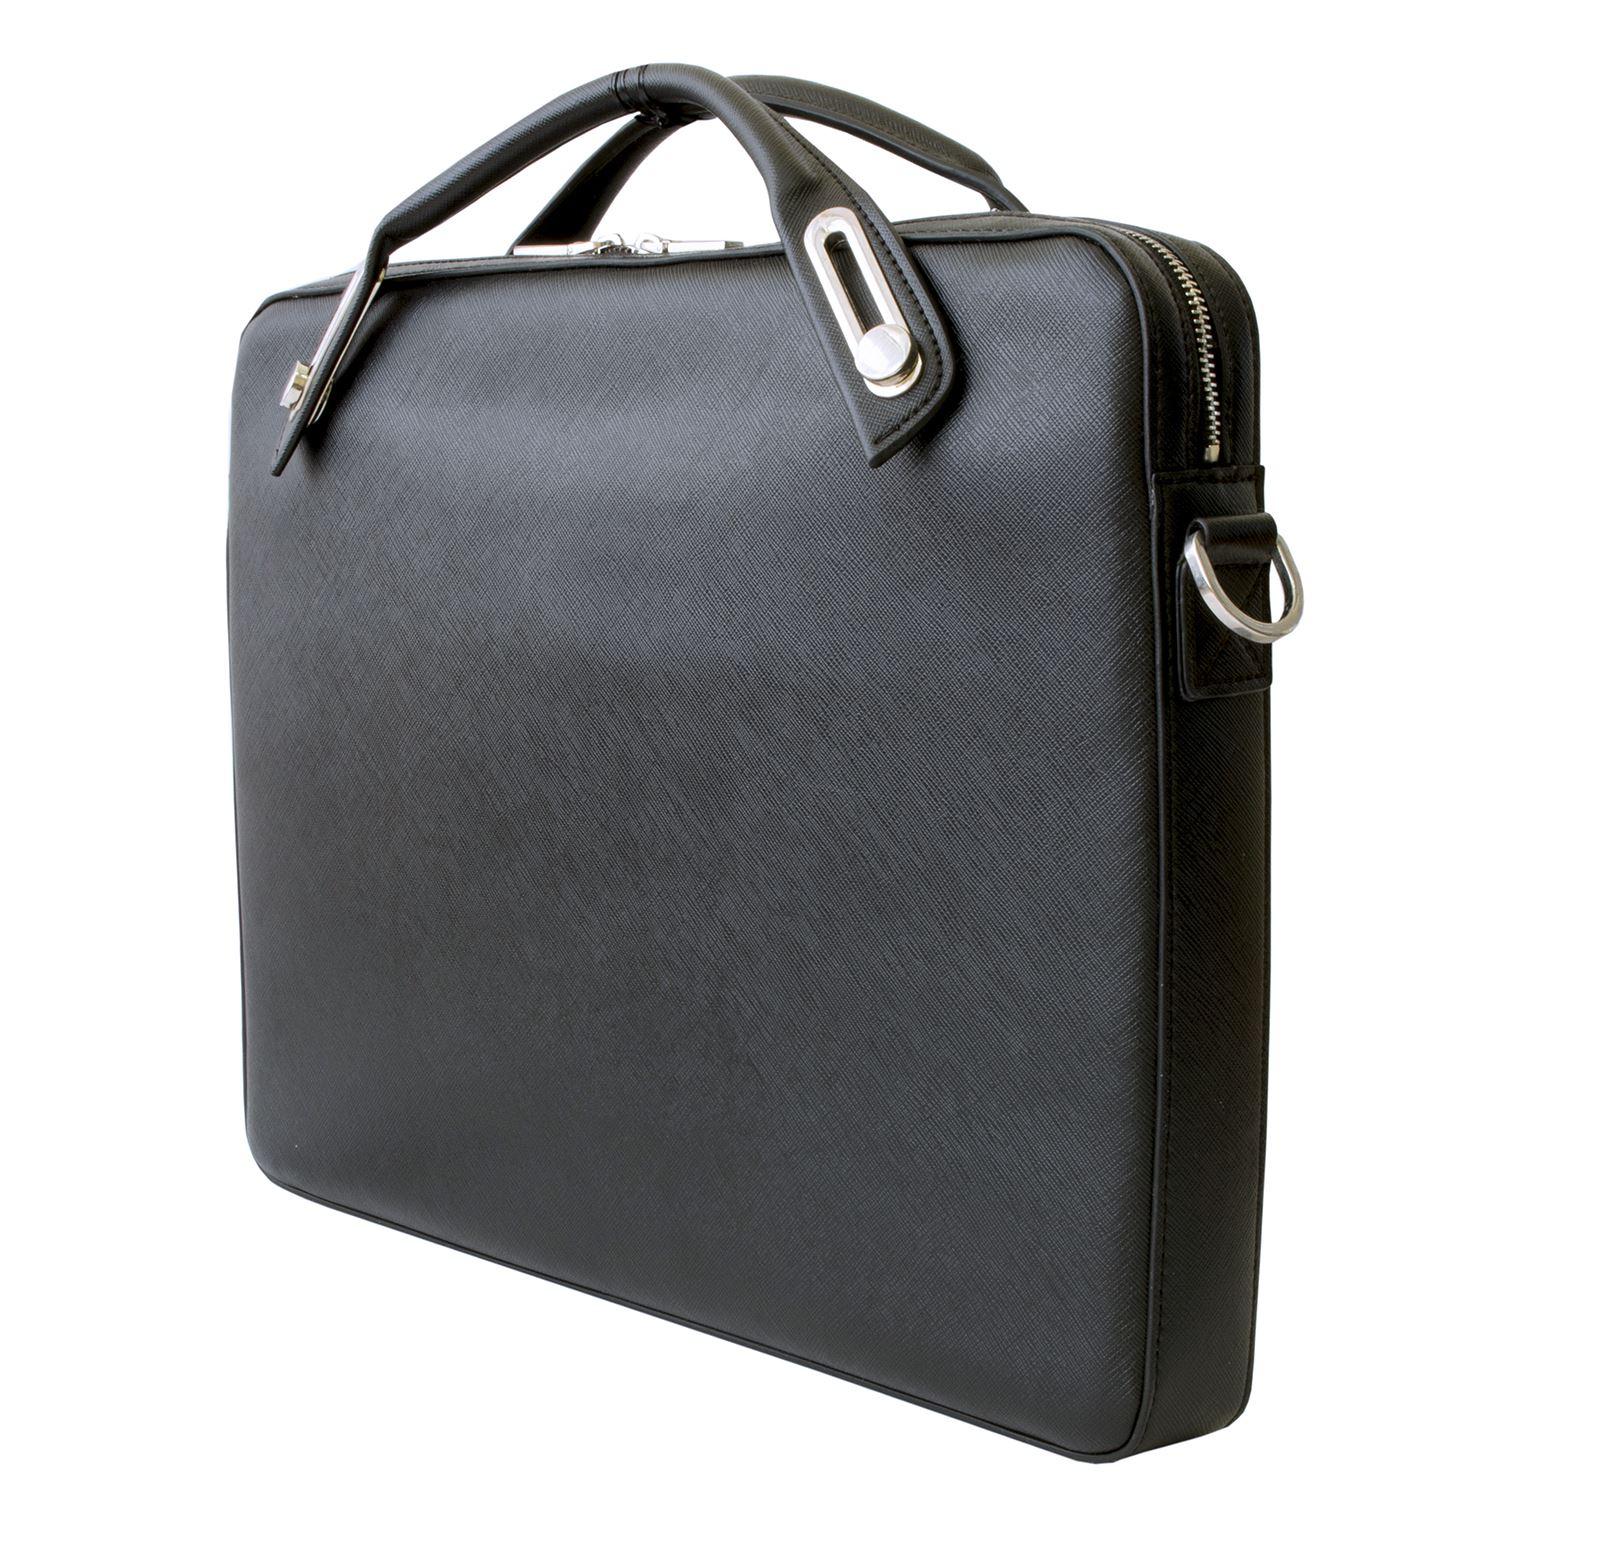 Abchic Abbi Designer Laptop Bag Woman Handbag For Laptop